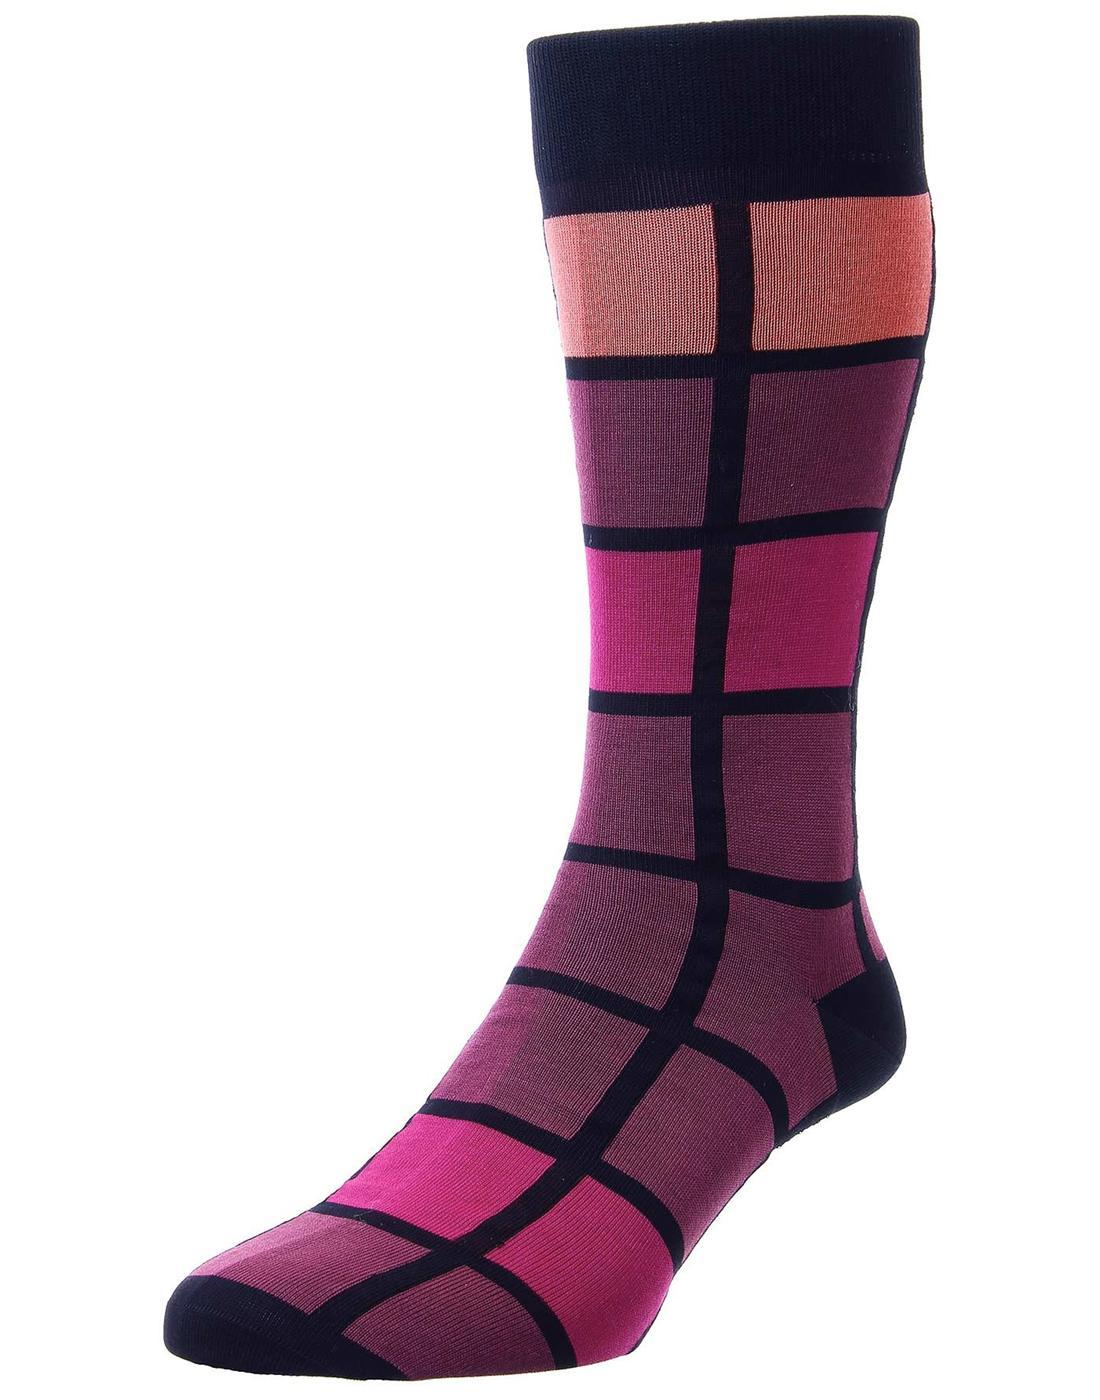 + Kauai PANTHERELLA Retro Windowpane Socks B